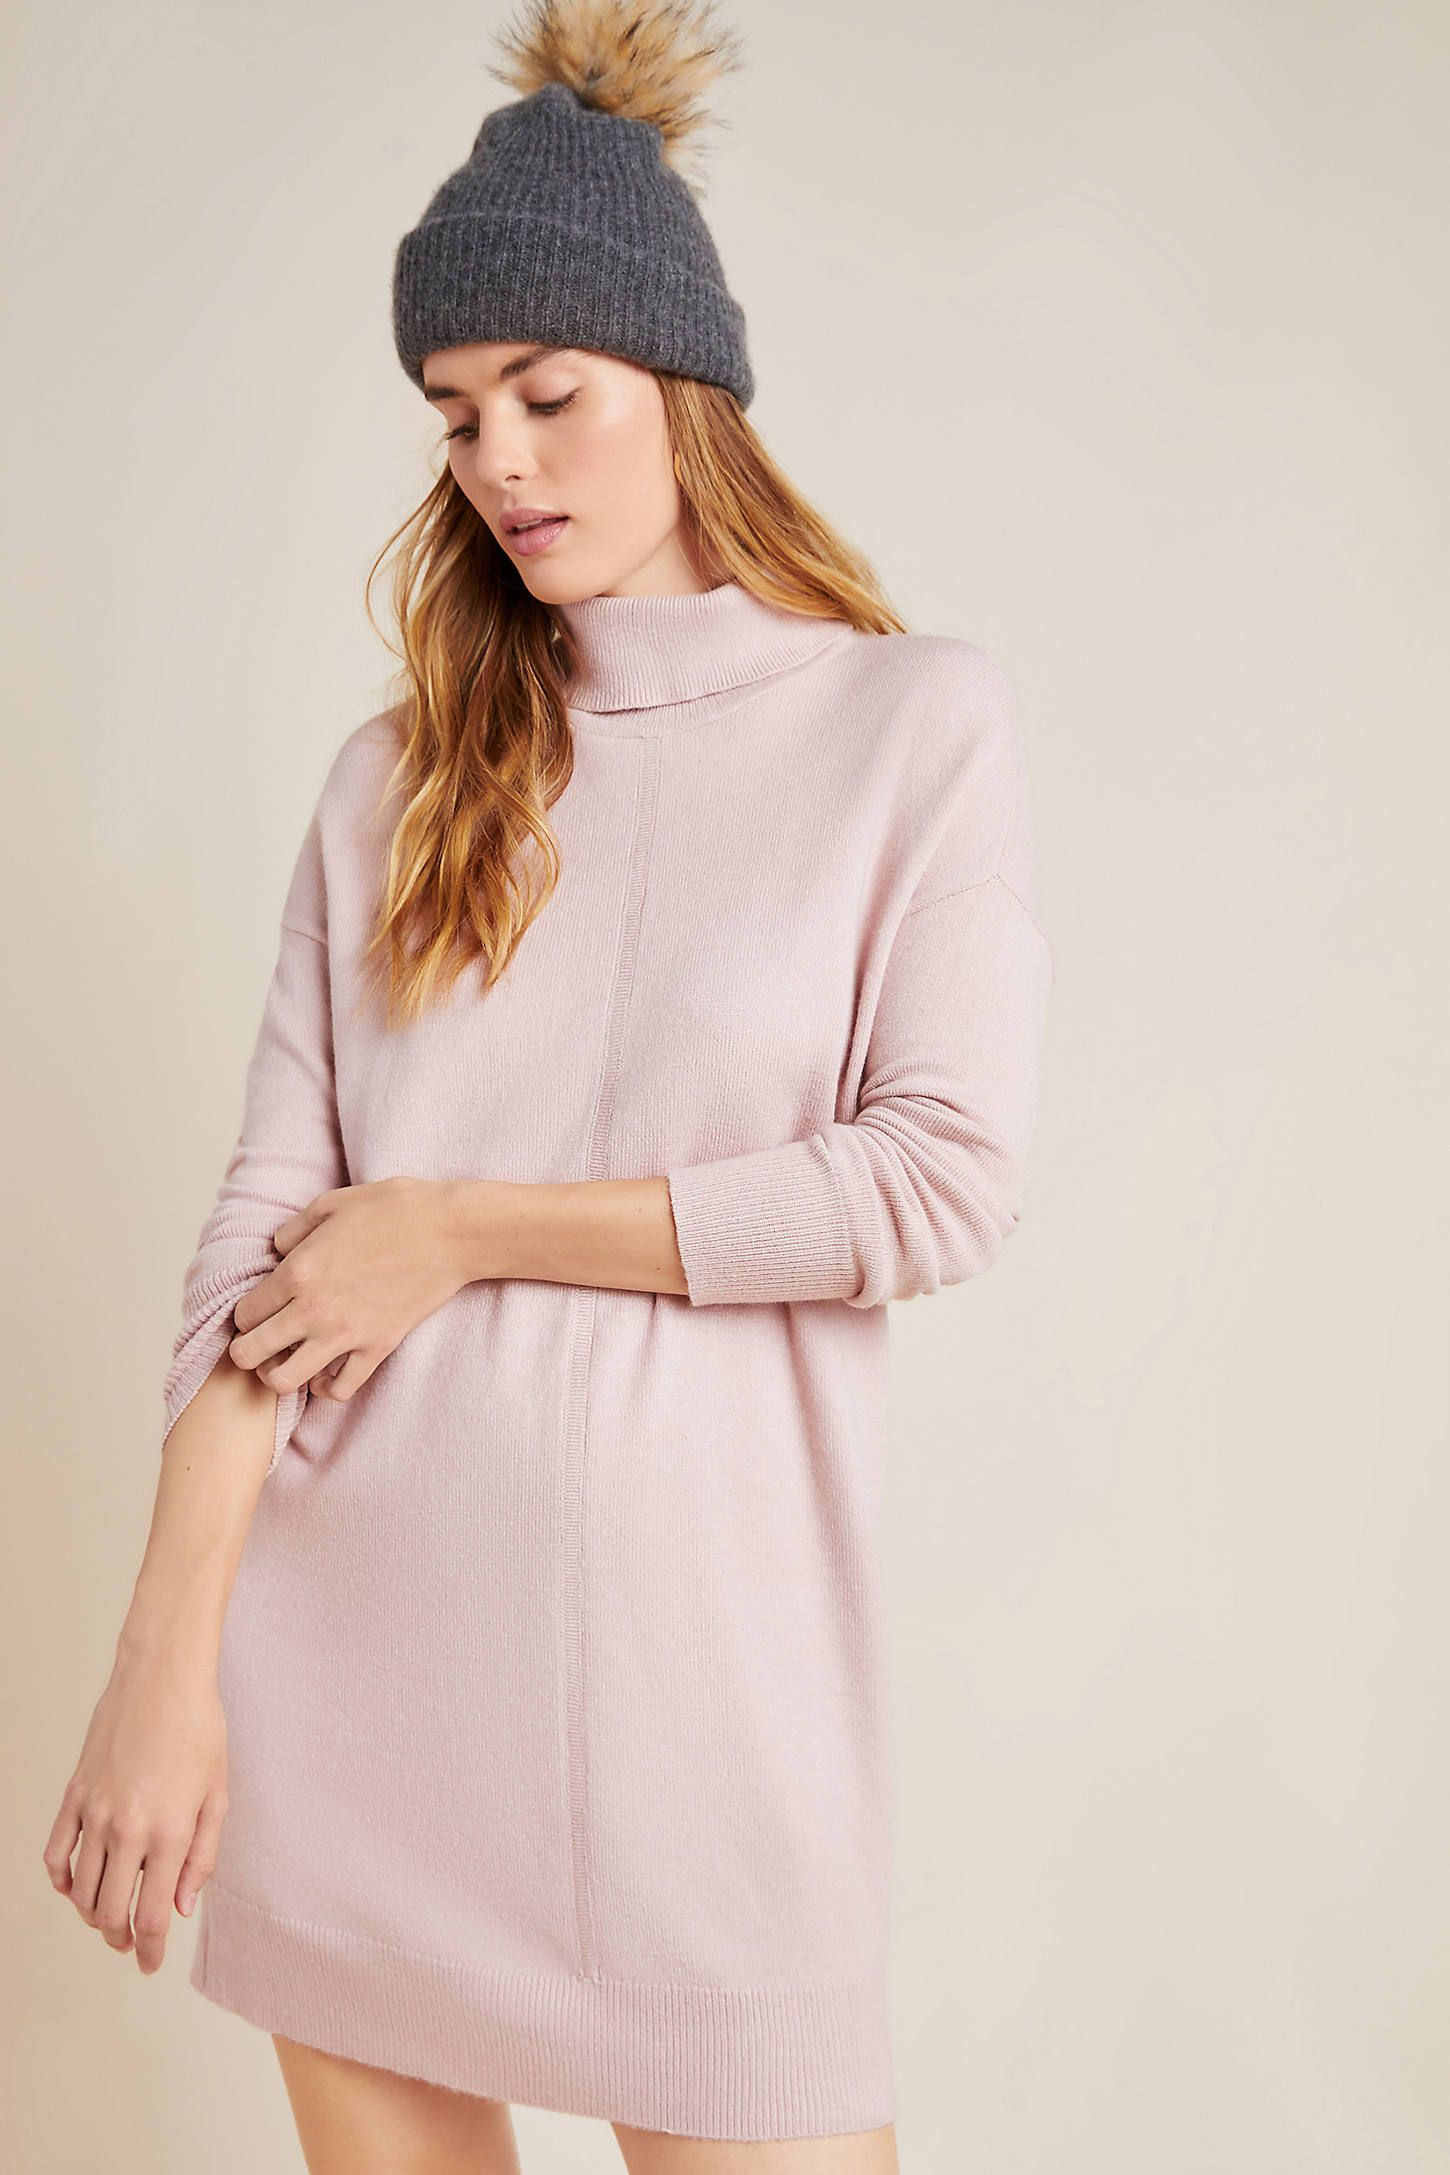 Maggie Turtleneck Sweater Dress 11